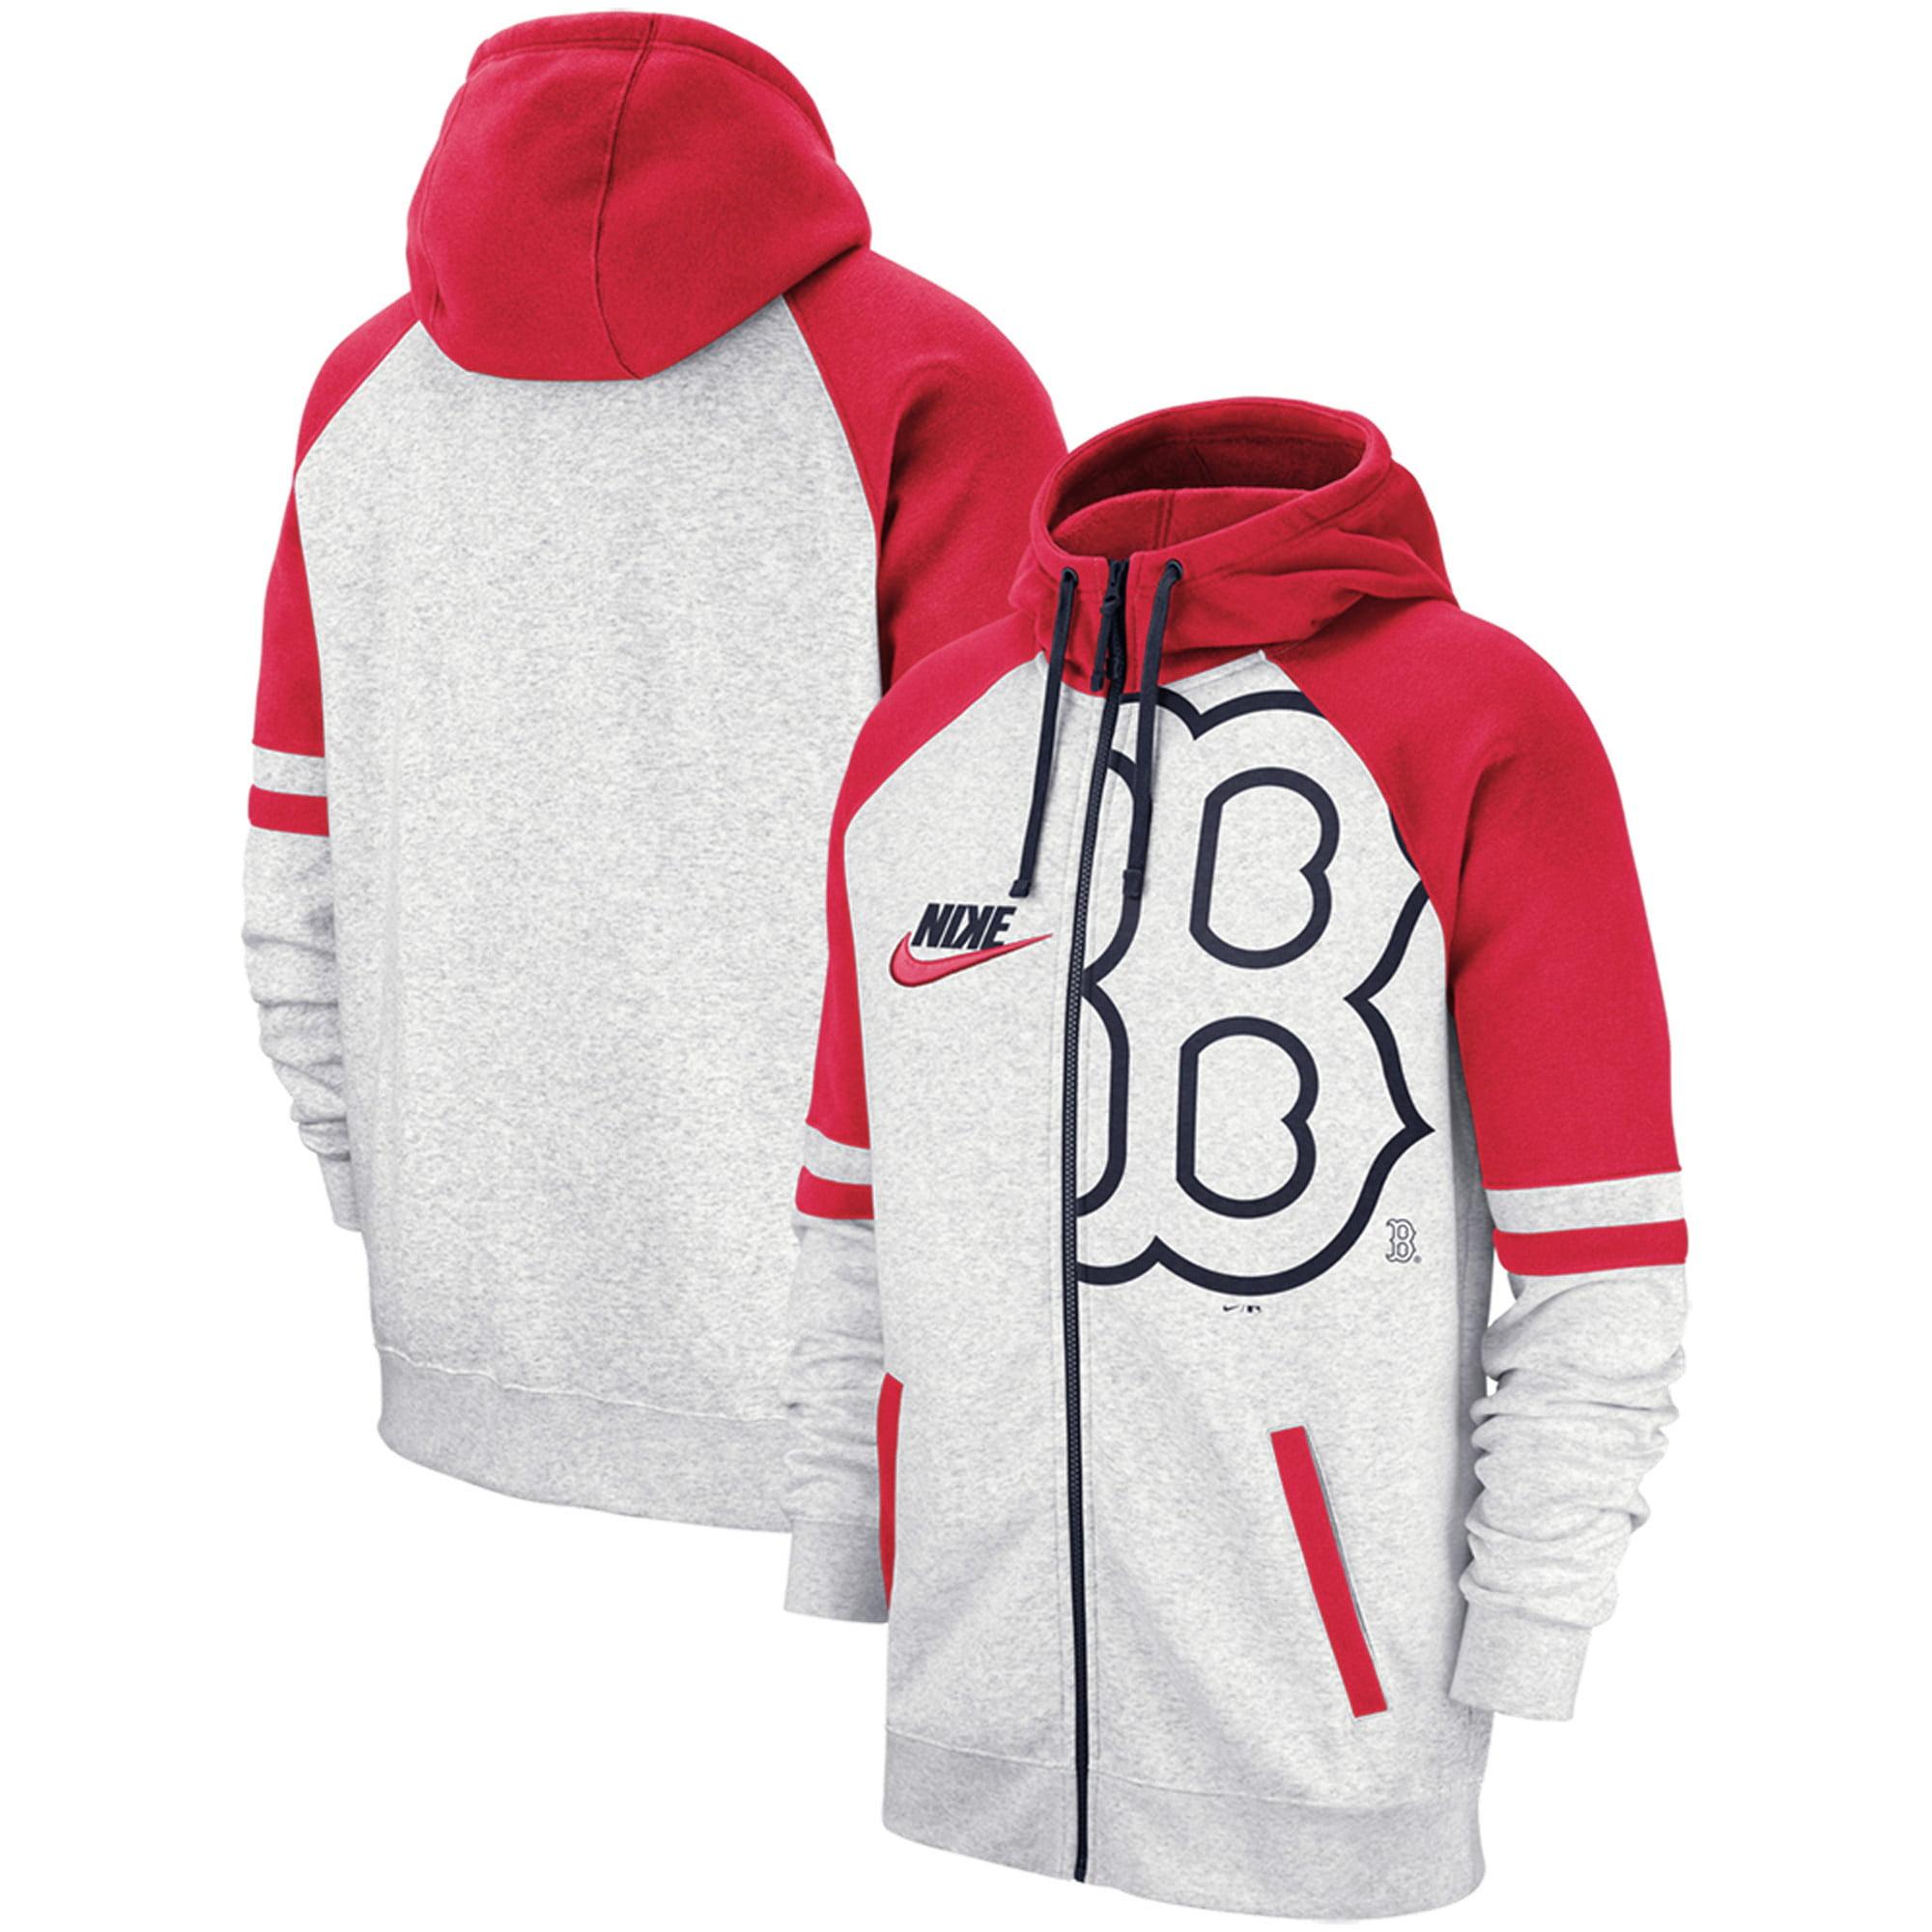 Boston Red Sox Nike Full-Zip Hoodie - Heathered Gray